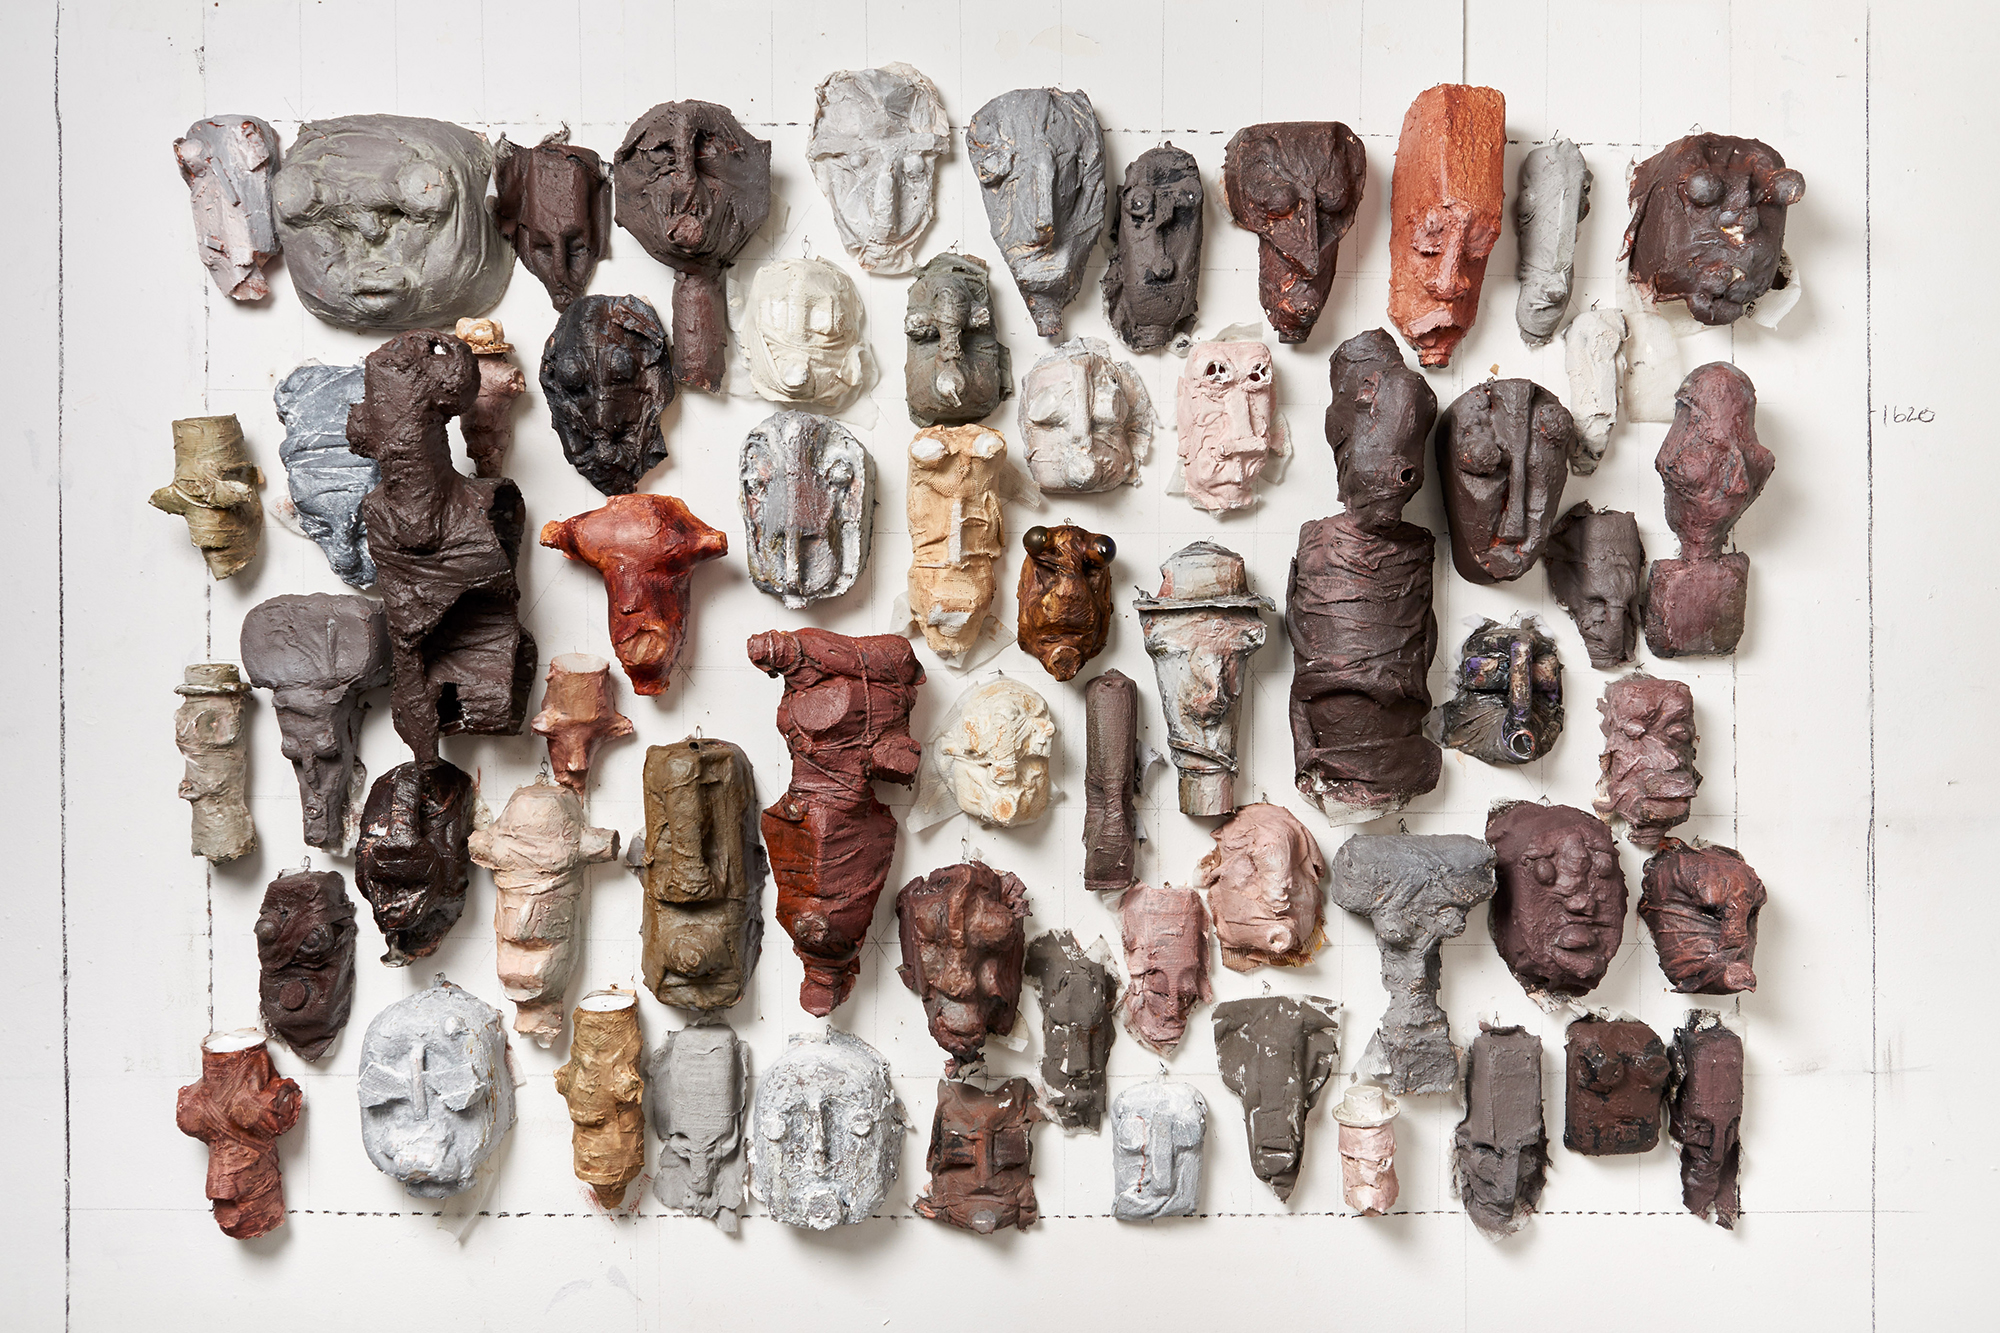 Kagiso Patrick Mautloa, Urban Mask, Sculpture